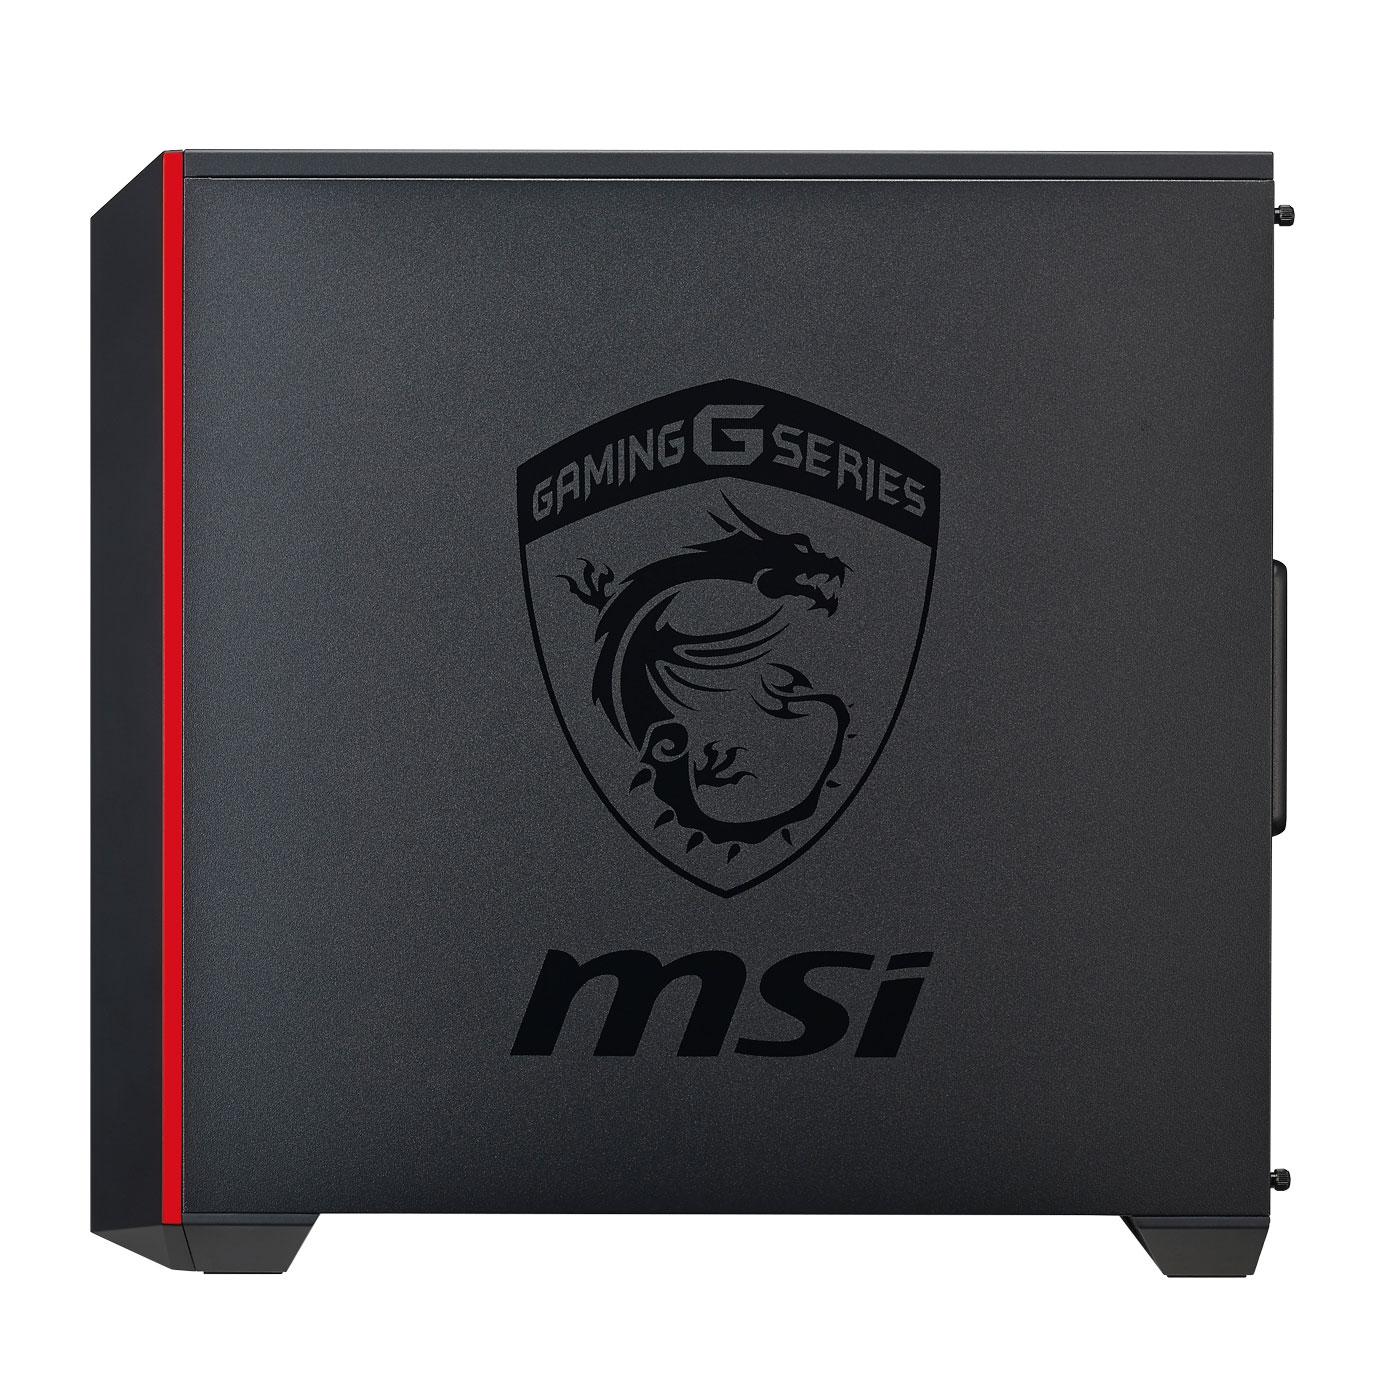 Cooler Master MasterBox 5 MSI MCX-B5S2-KWNN-03-MI Rouge - Boîtier PC - 1